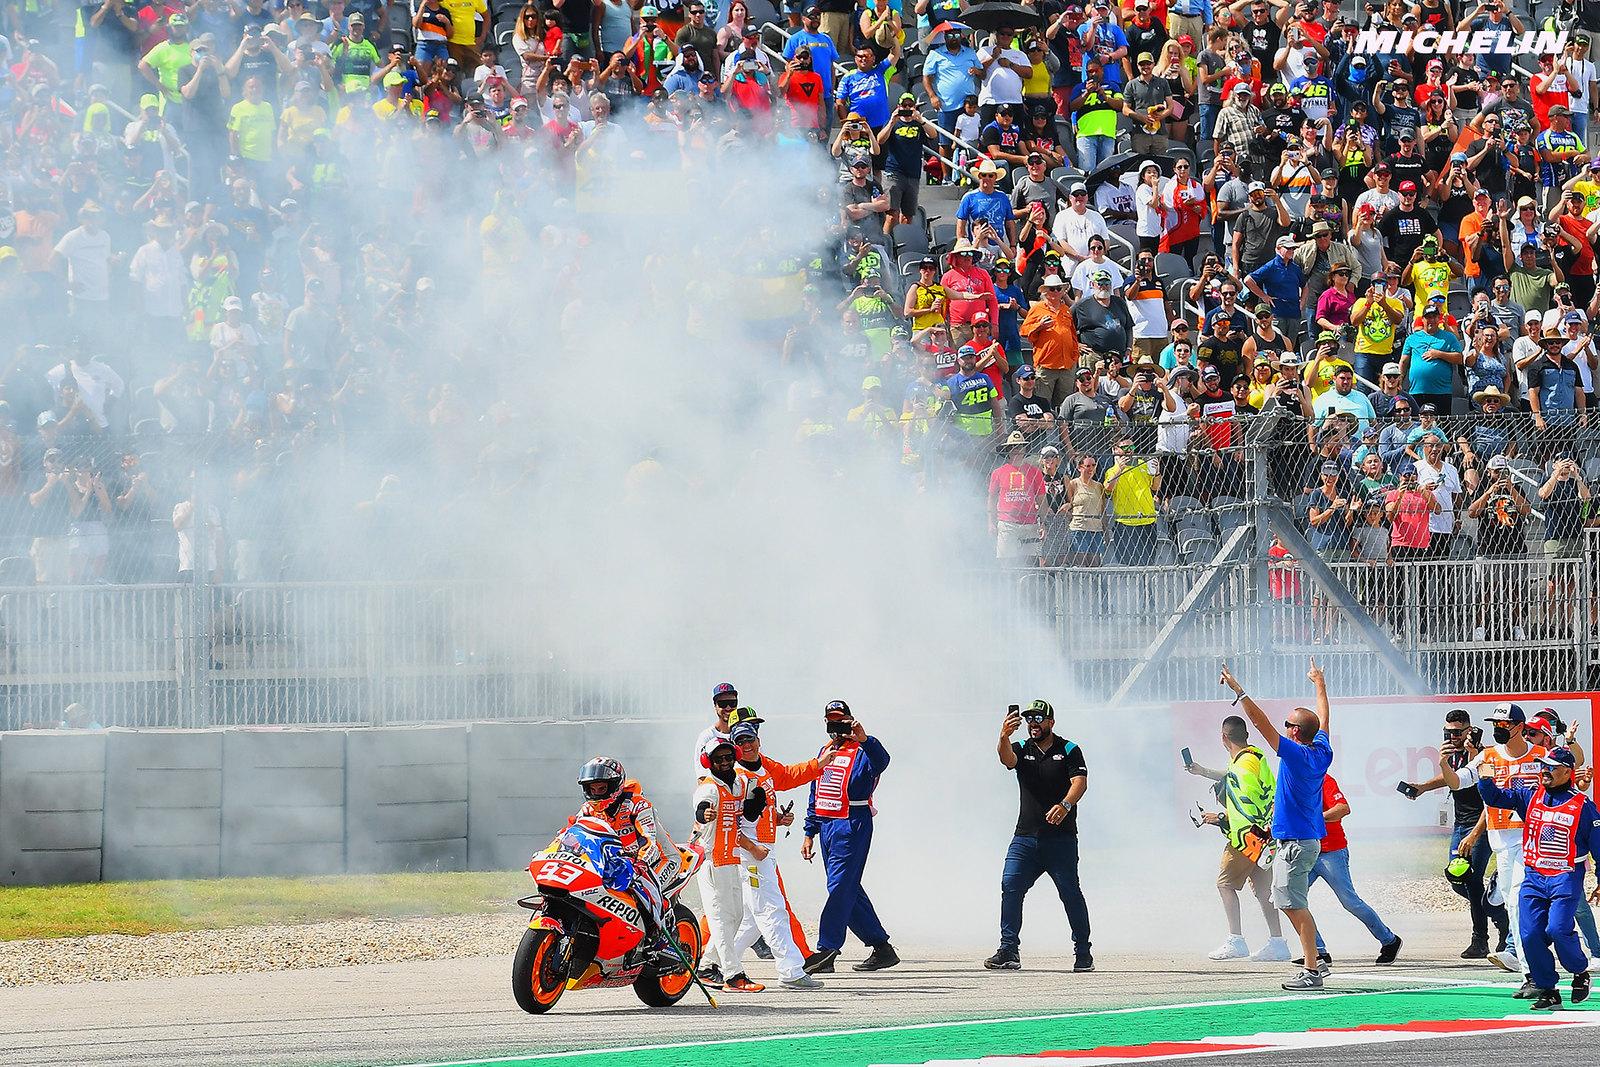 MotoGP2021アメリカズGP 優勝マルク・マルケス「昨日夢見た通り完璧なレースだった」